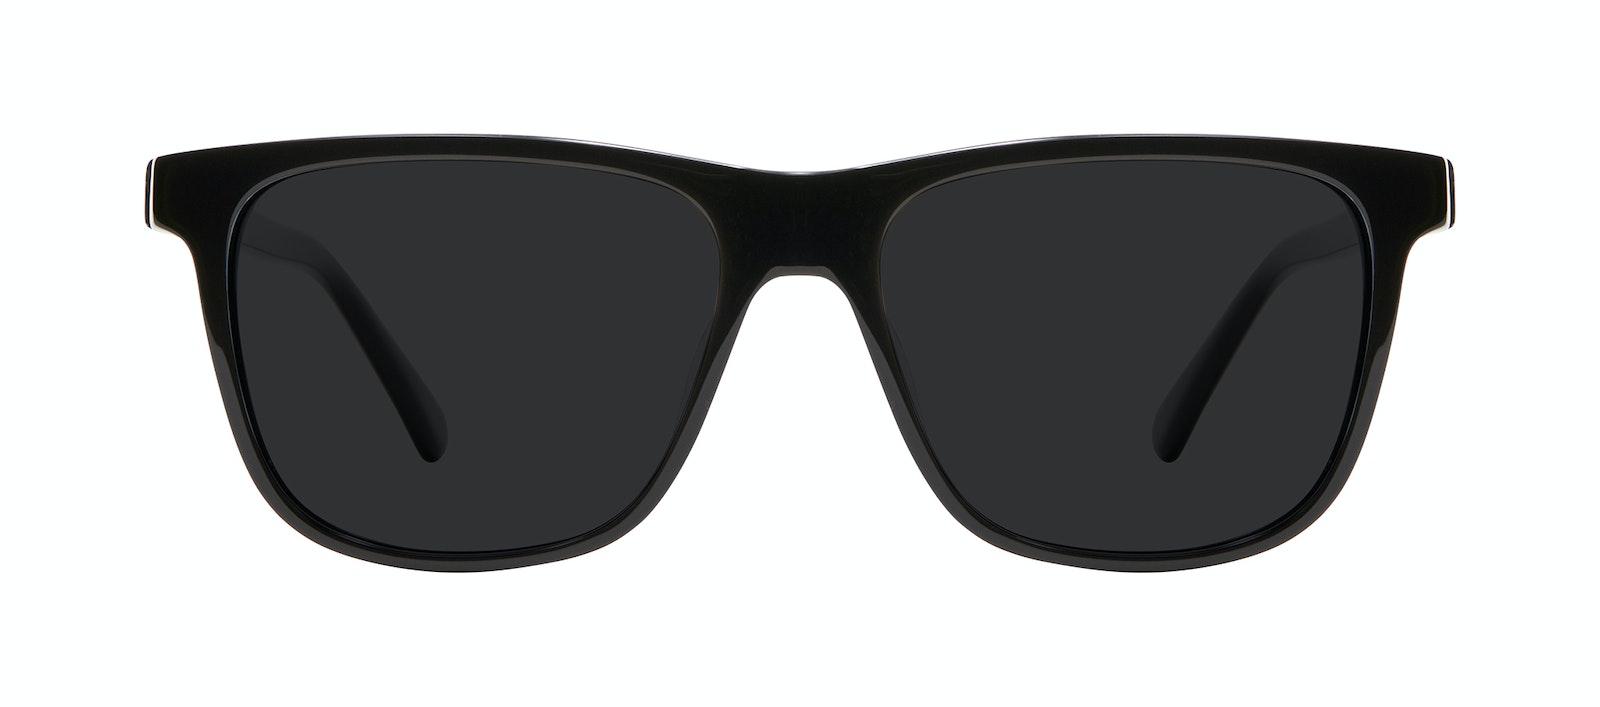 Affordable Fashion Glasses Square Sunglasses Men River Black Front